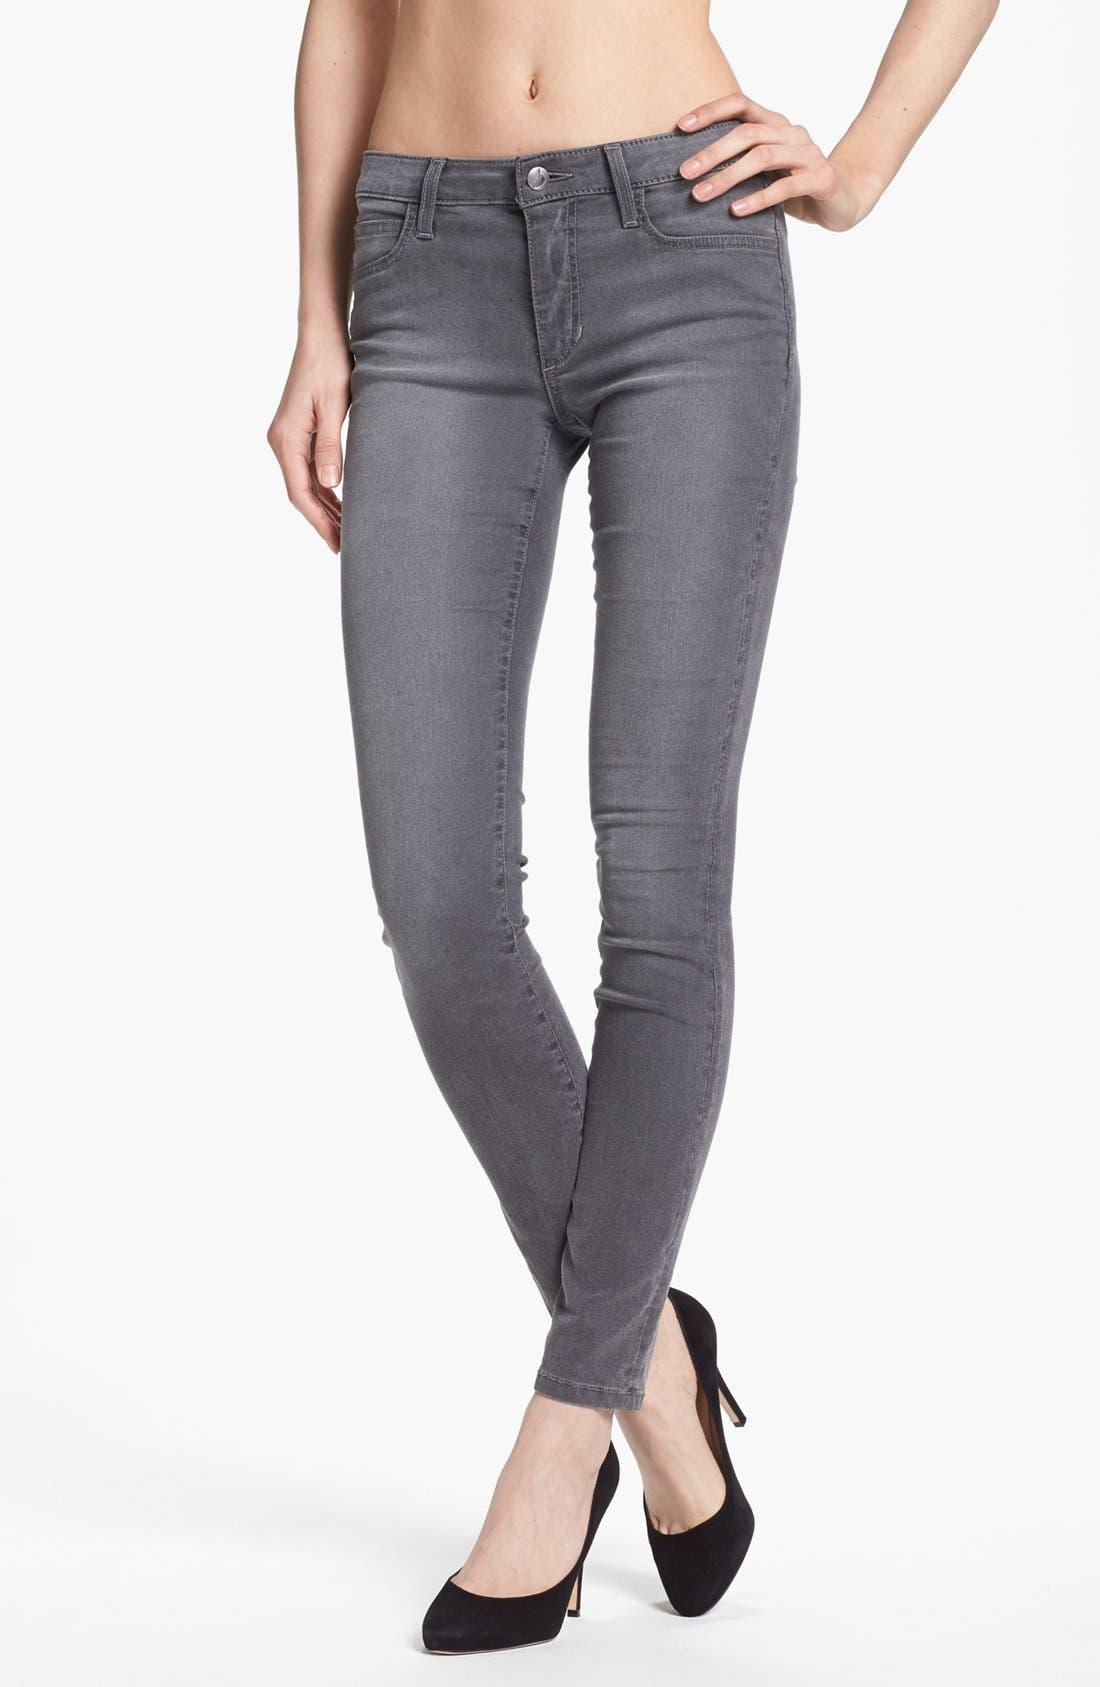 Alternate Image 1 Selected - Joe's Skinny Ankle Jeans (Grey)